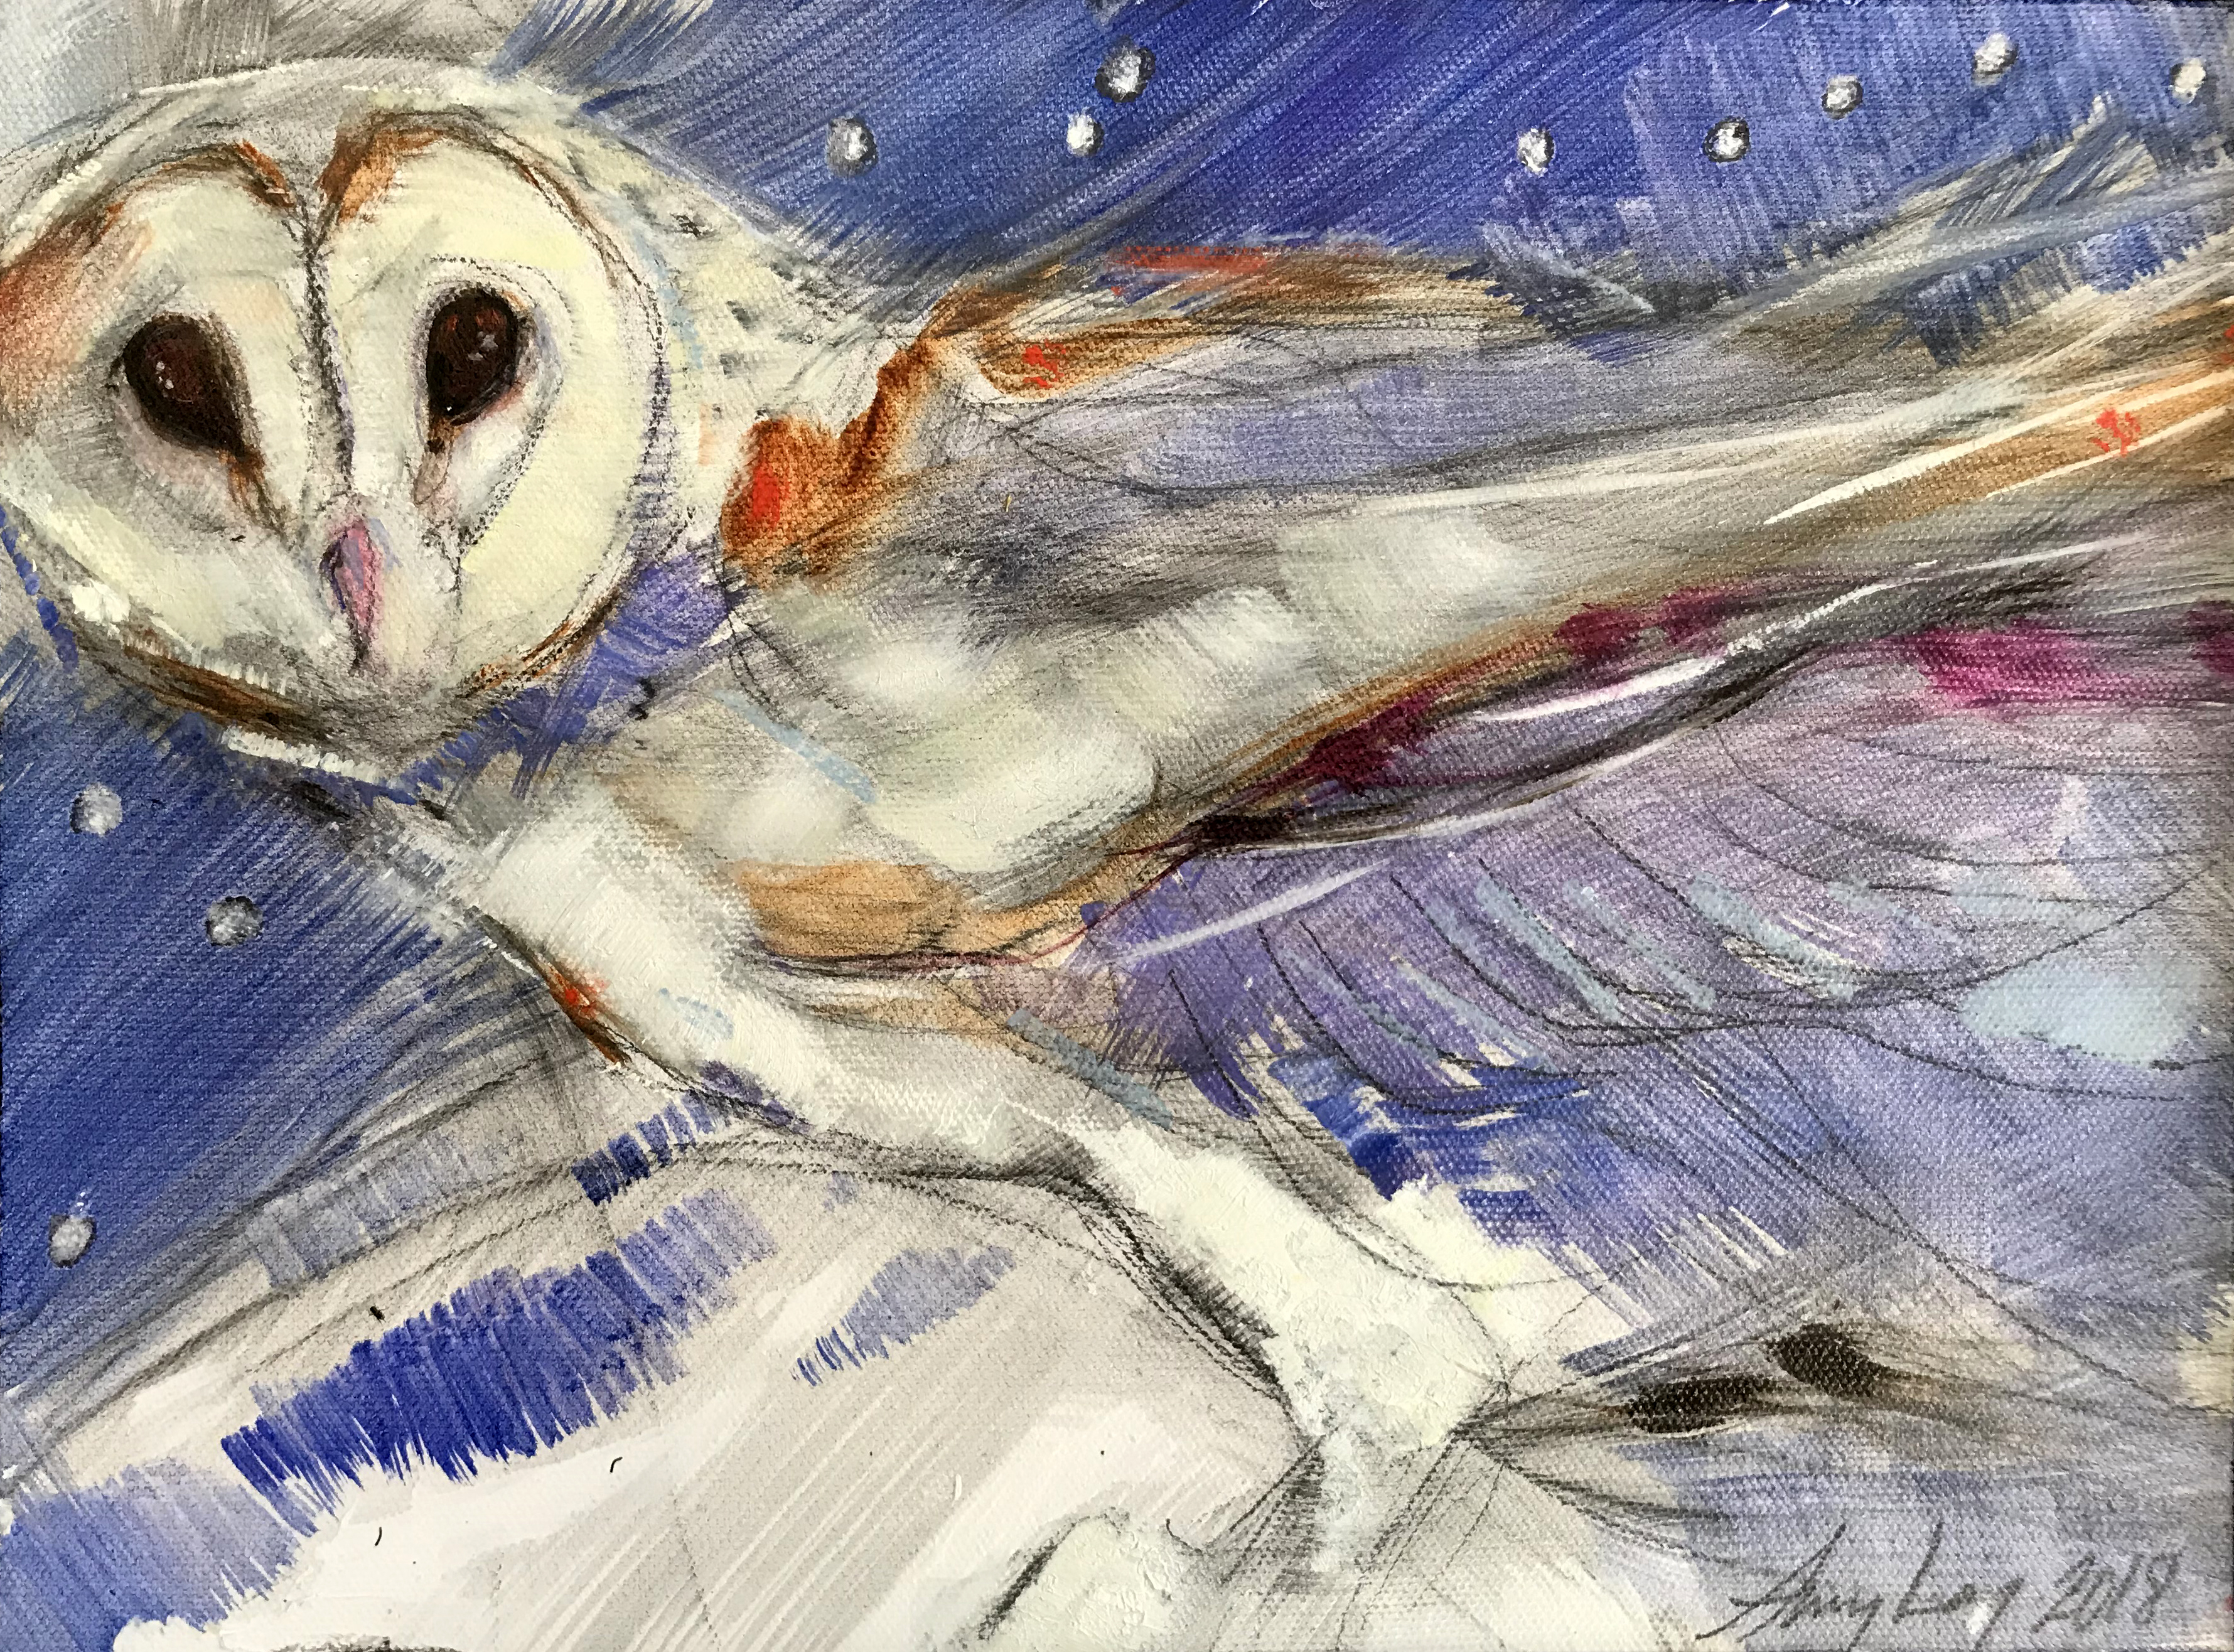 SWIFT OWL